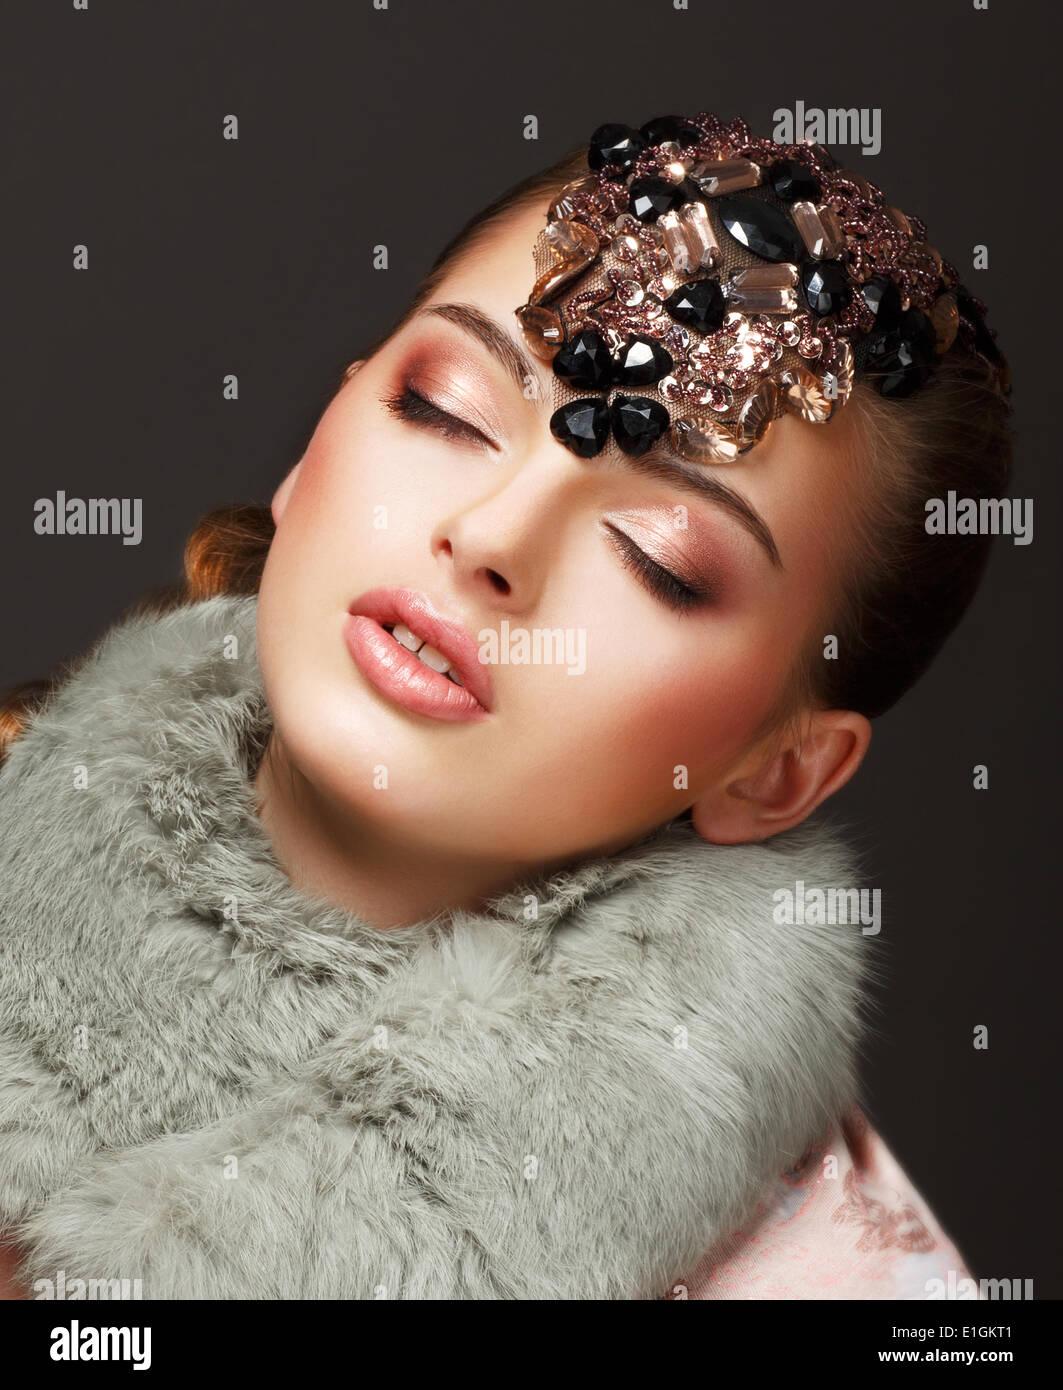 Leidenschaft. Glamouröse verträumte Frau Pelz Mantel und Juwelen. Luxus Stockbild